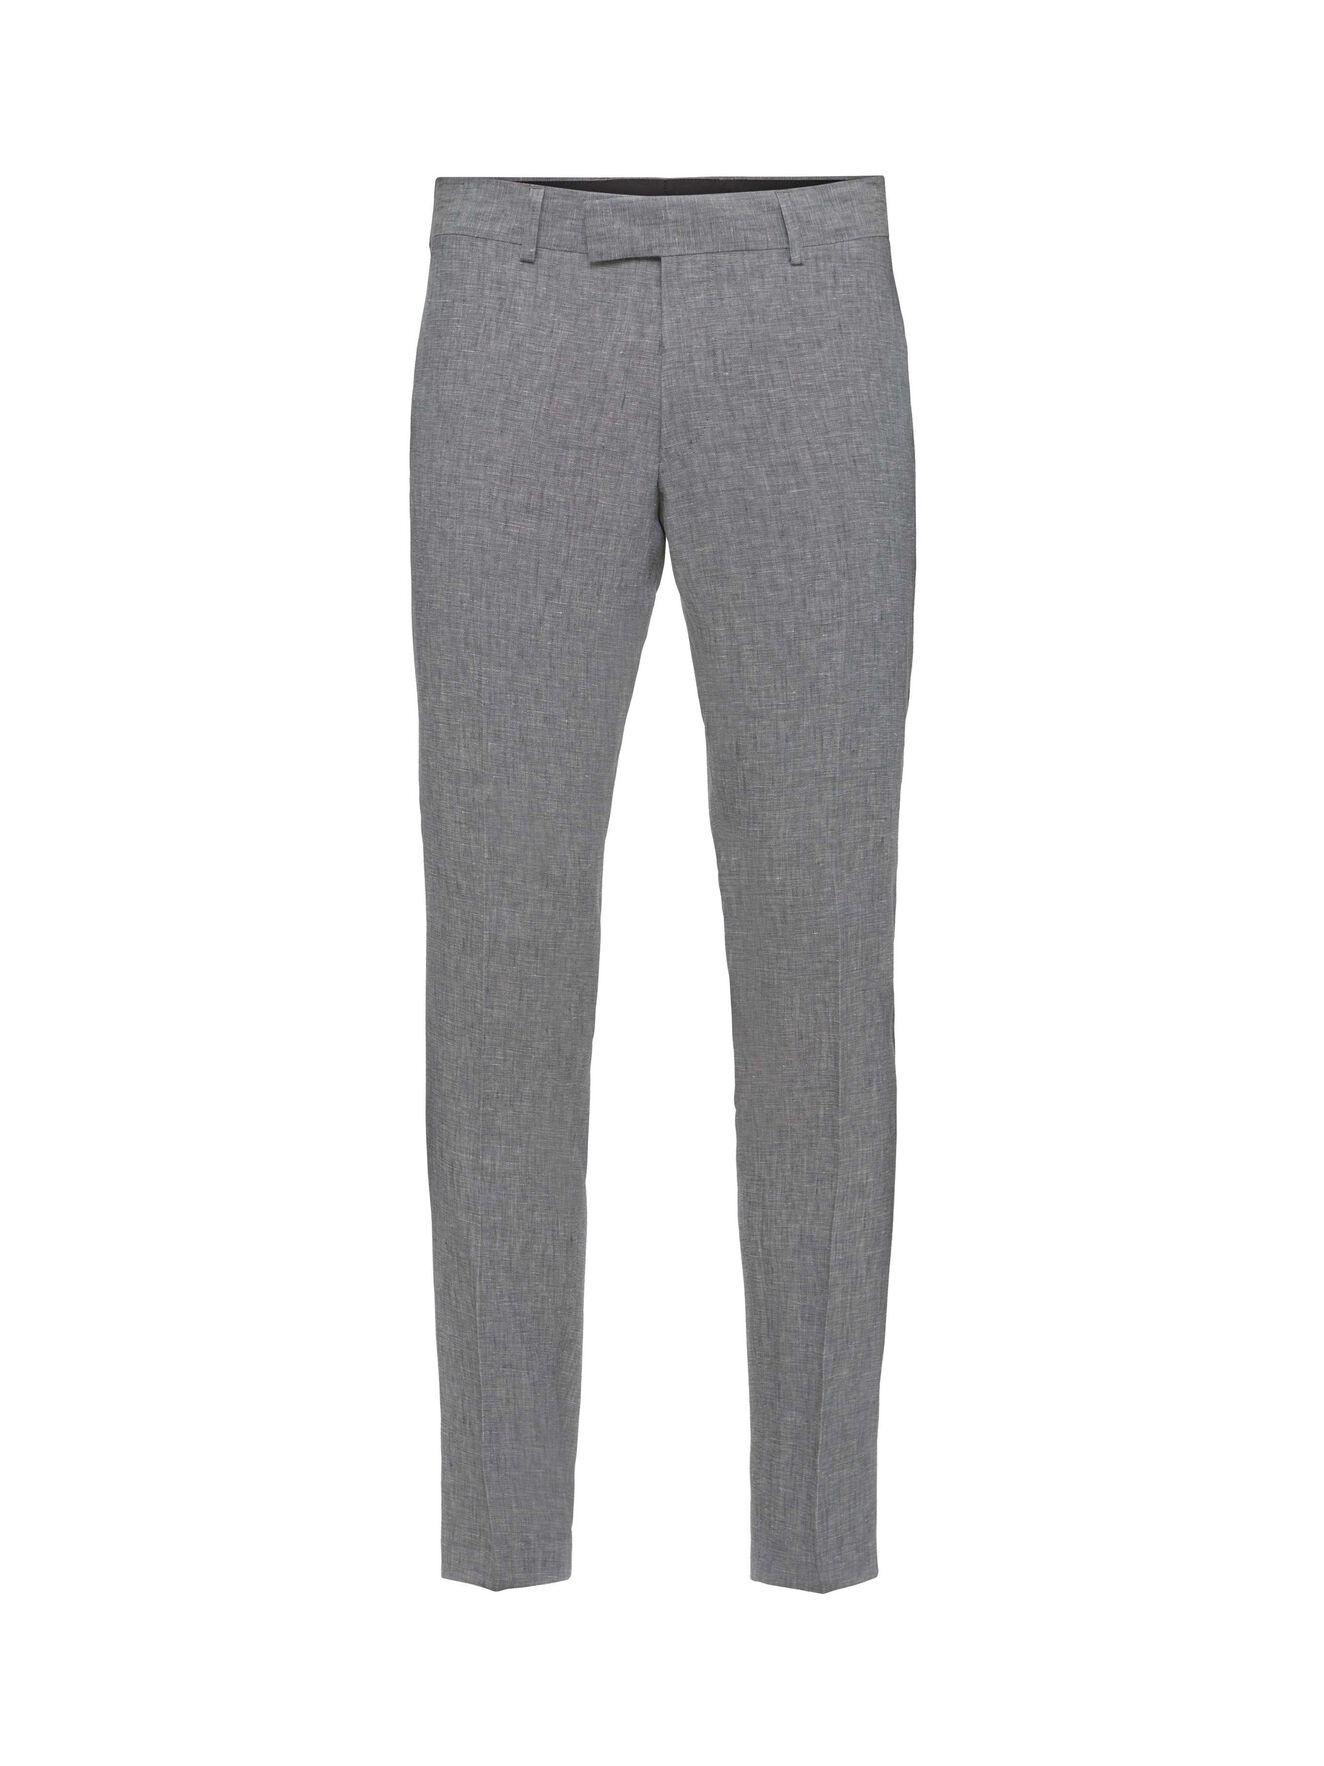 Gordon Trousers in Light grey melange from Tiger of Sweden